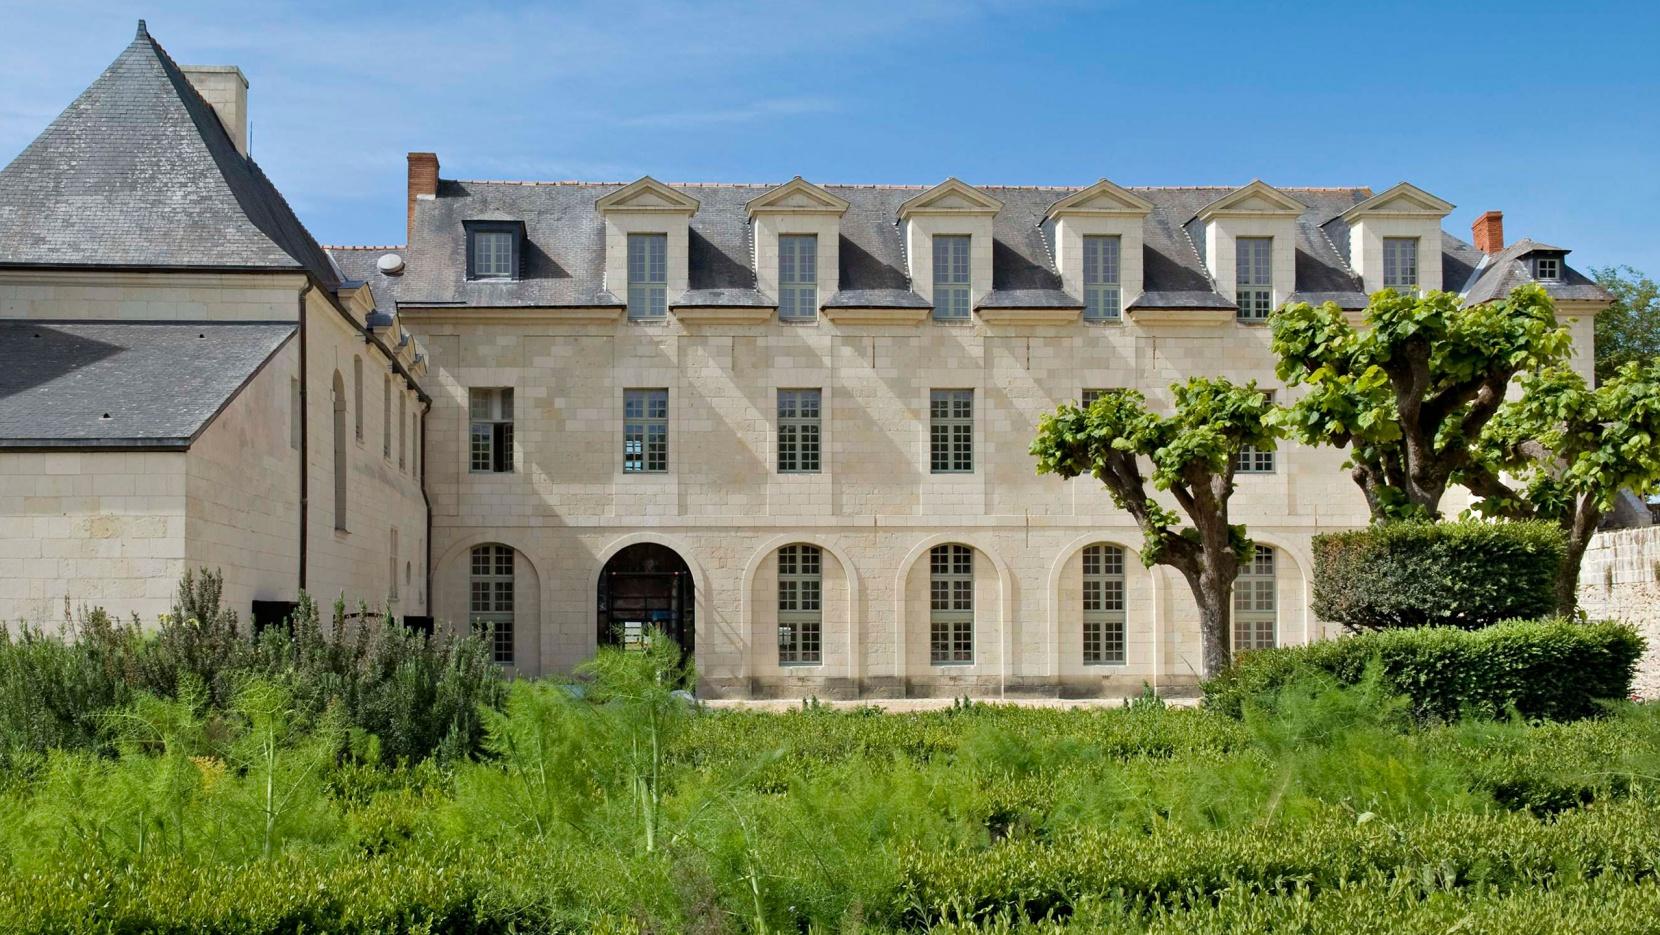 The abbaye de fontevraud hotel in anjou france yatzer - Hotel abbaye de fontevraud ...